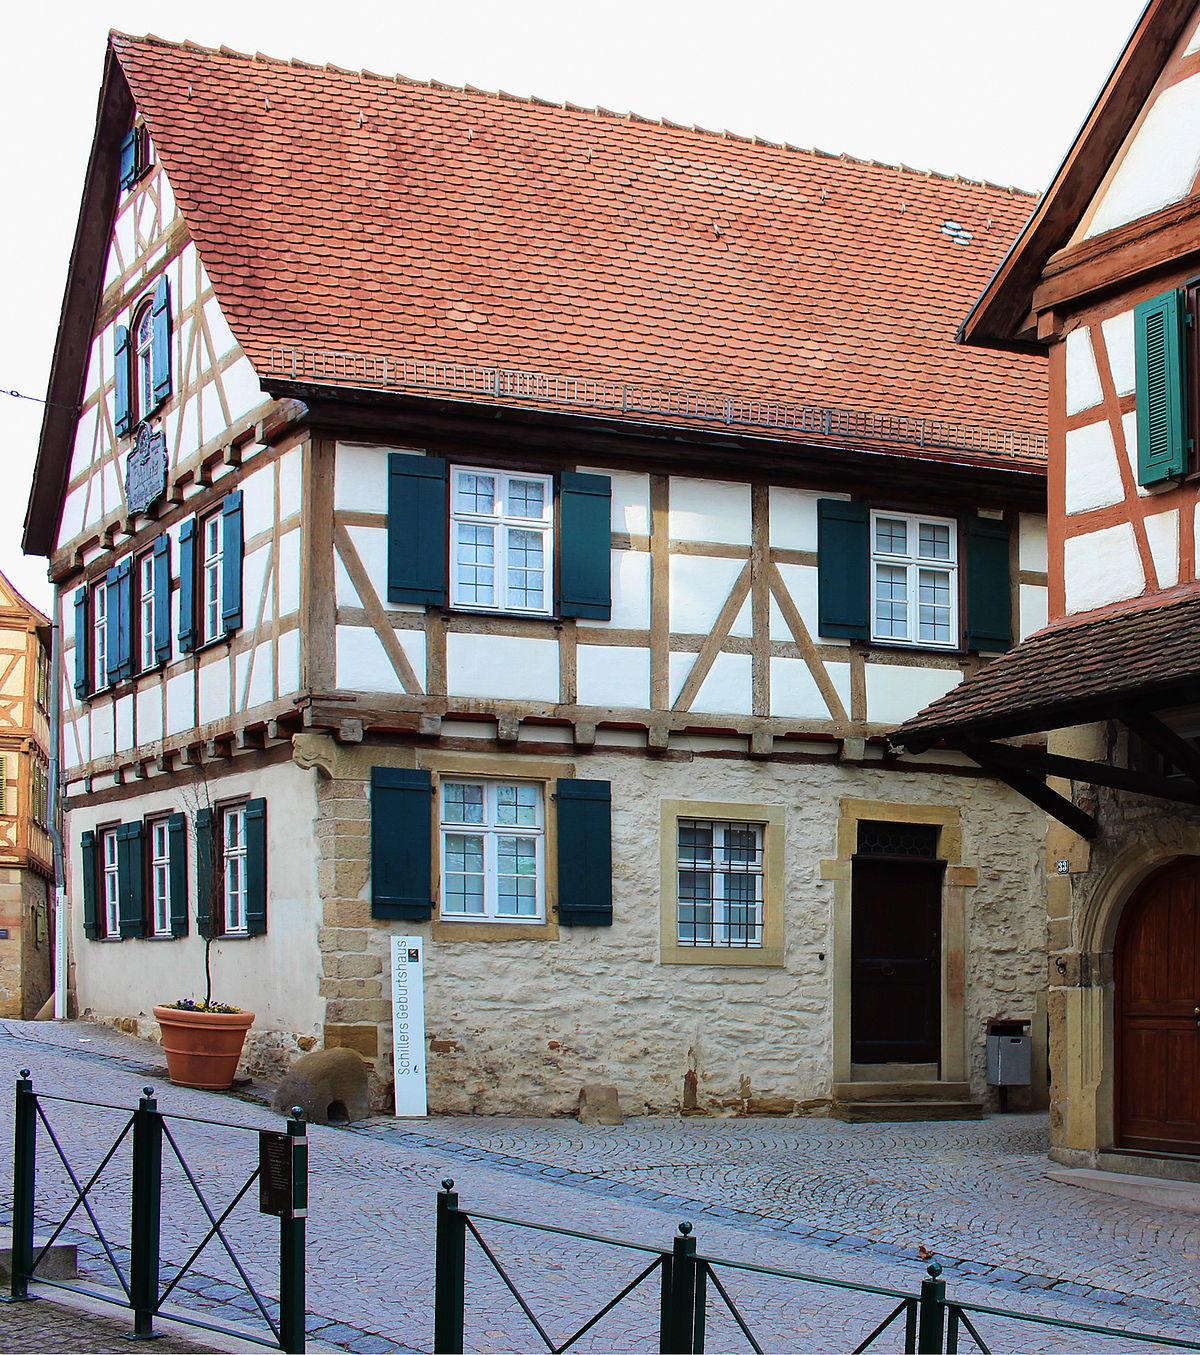 Mädel aus Marbach am Neckar